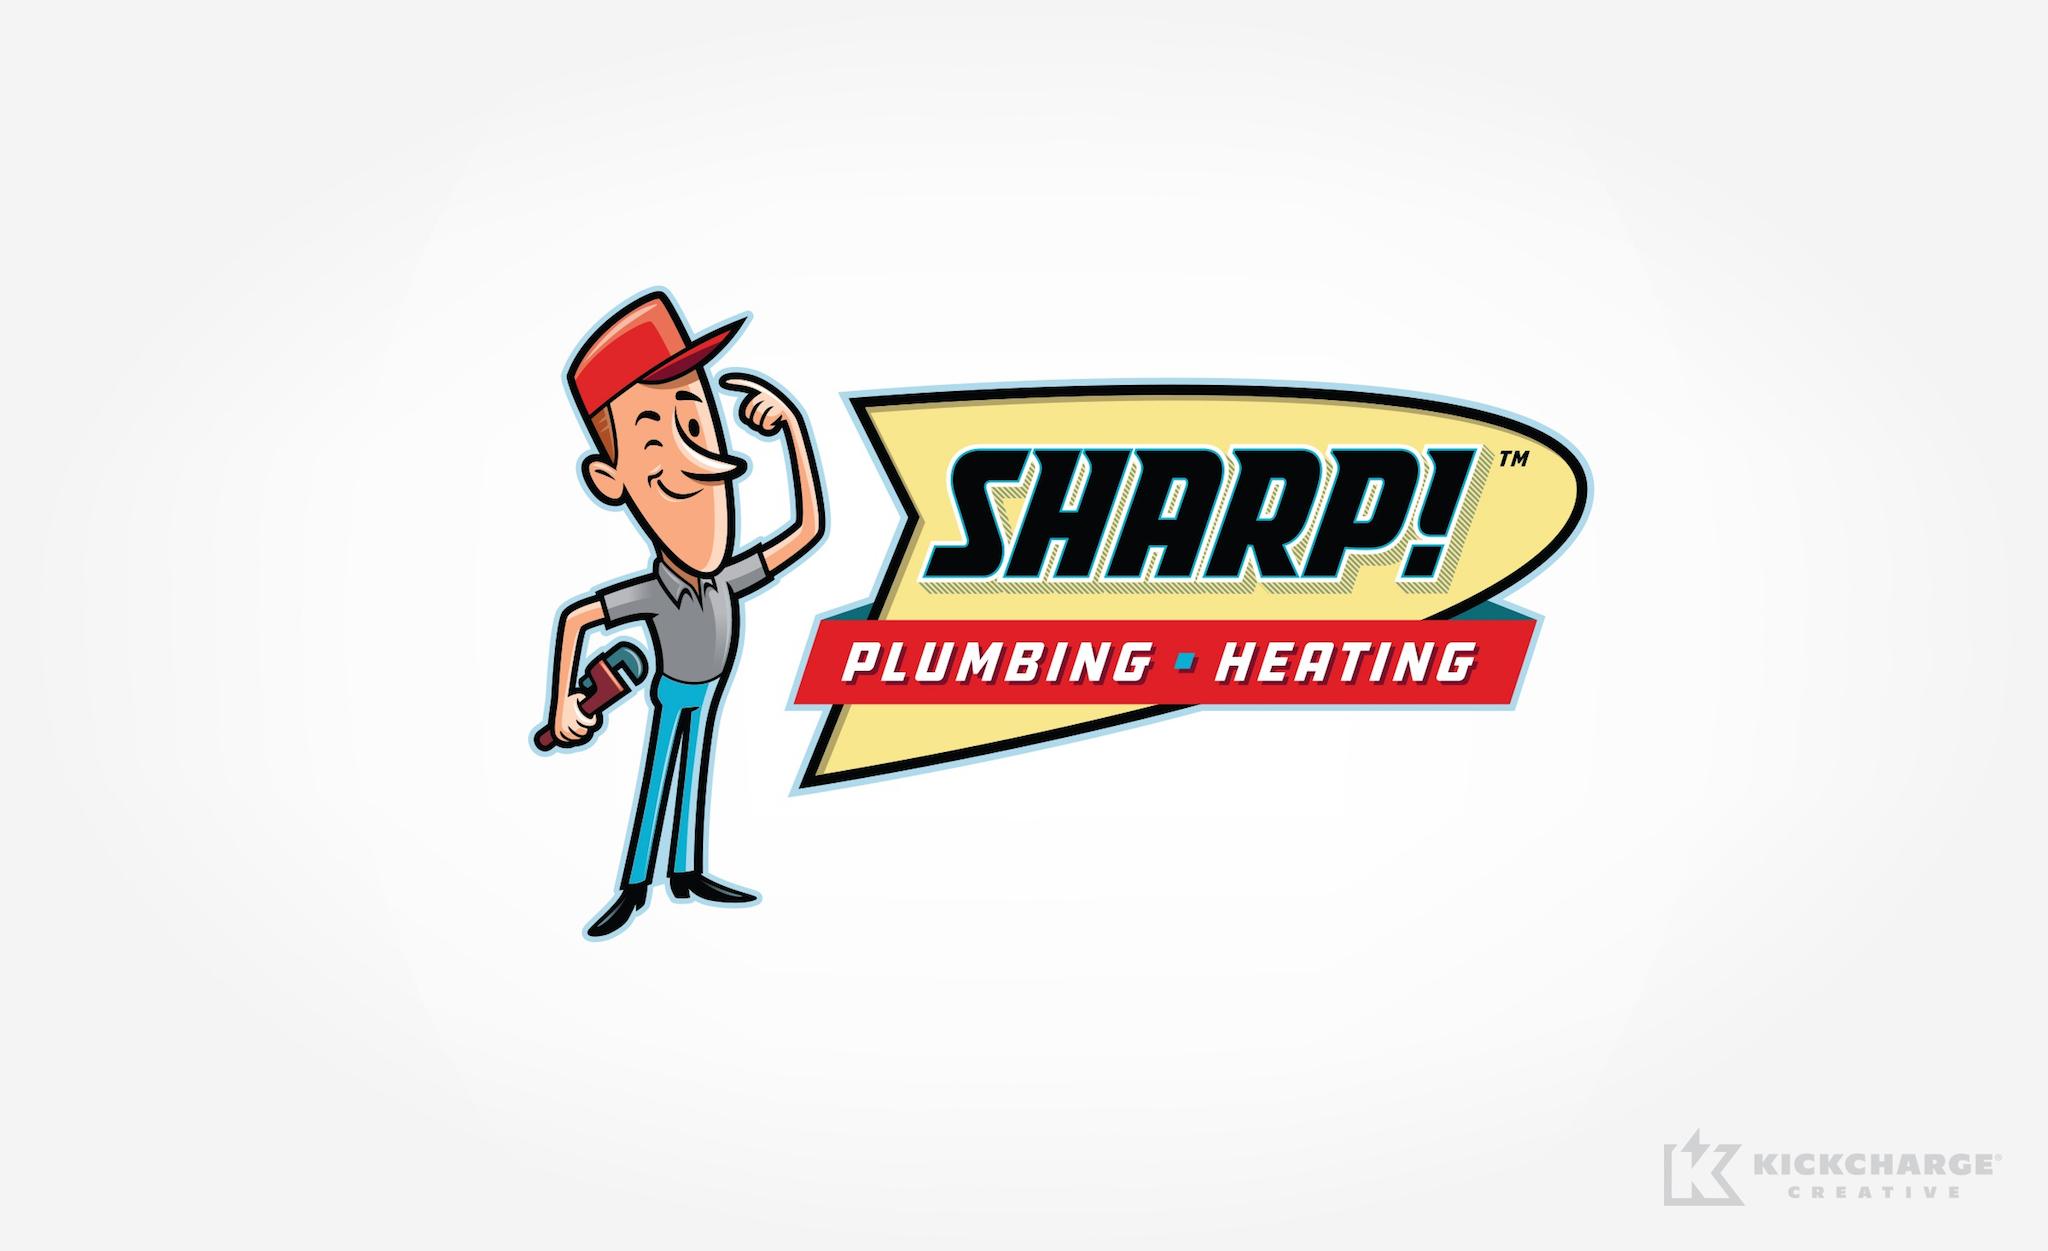 plumbing logo for Sharp! Plumbing